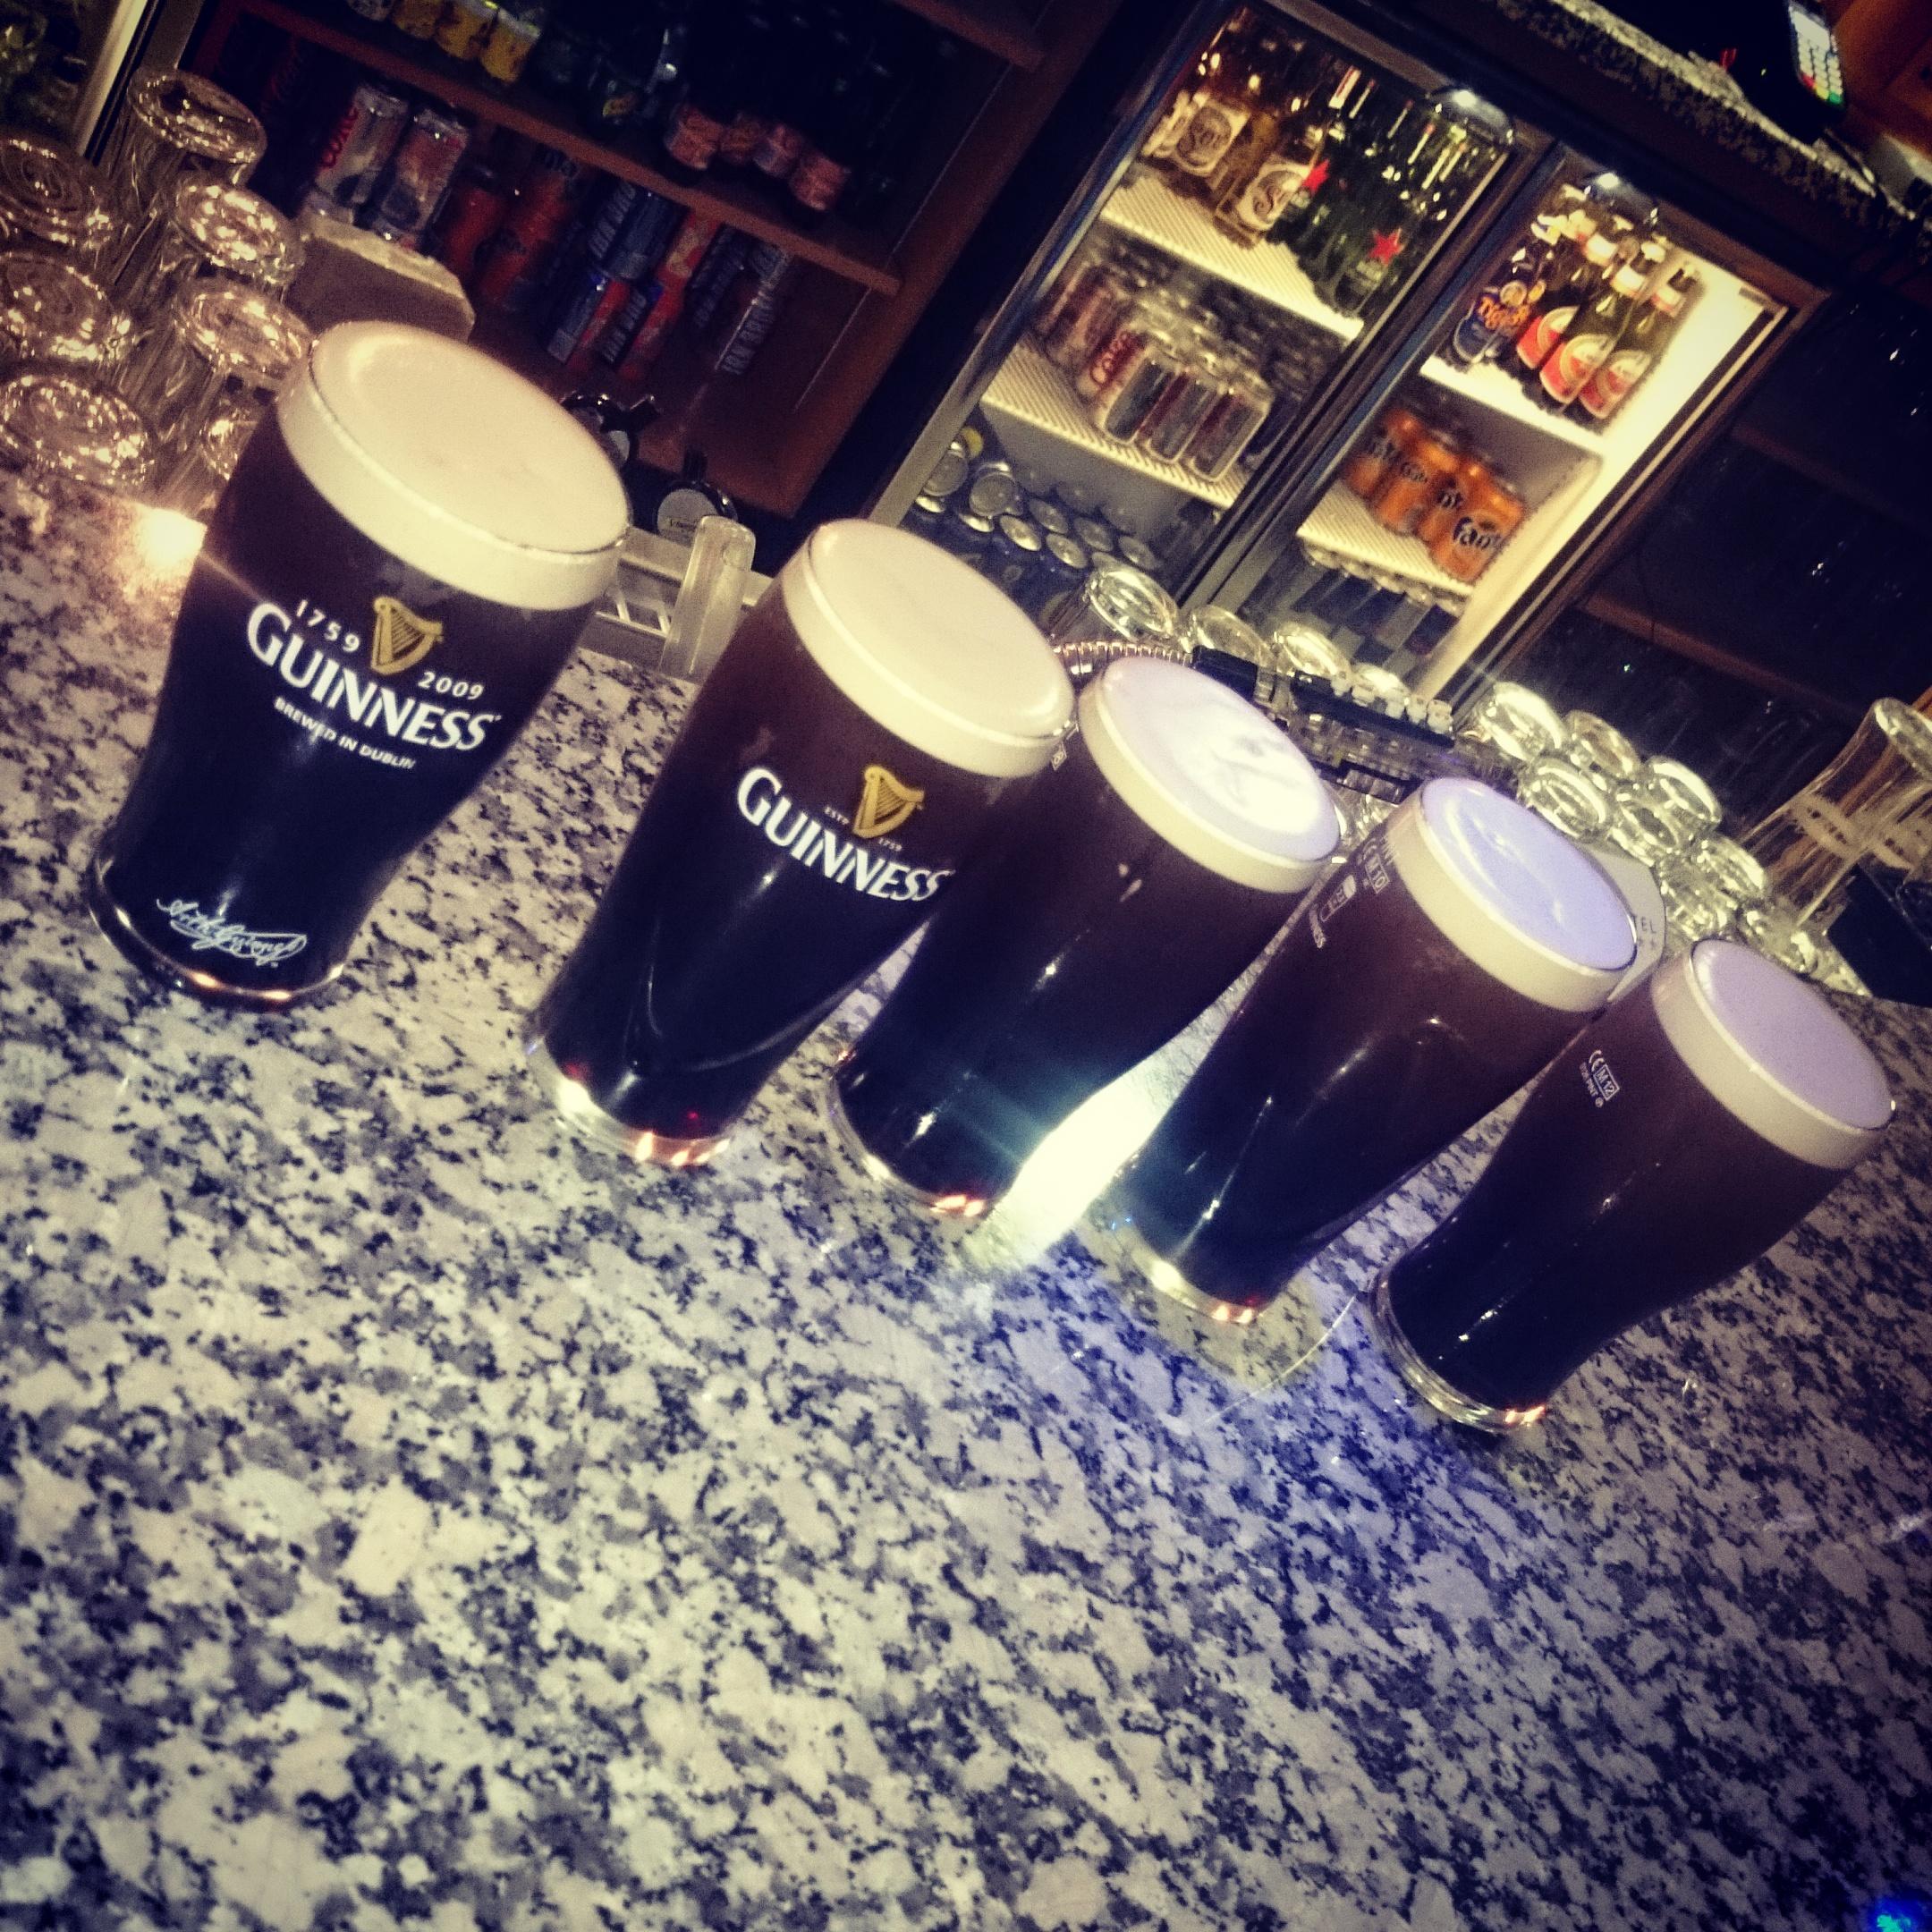 Irish nectar